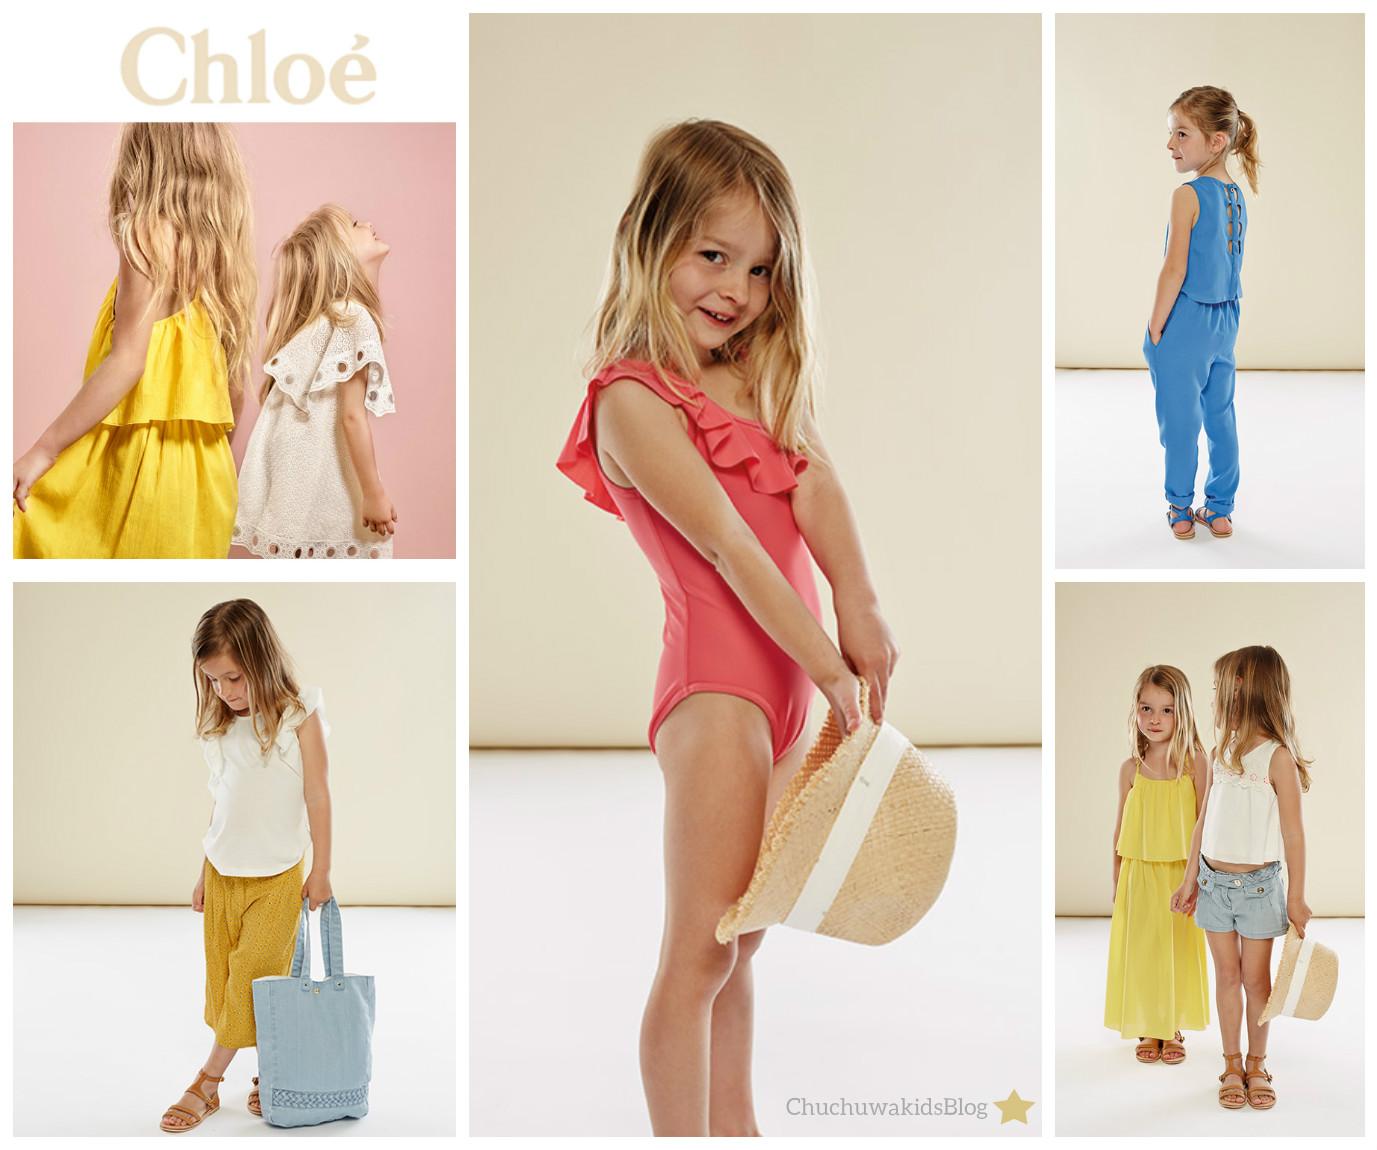 Blog moda infantil chlo ni os colecci n primavera for Jardin infantil verano 2016